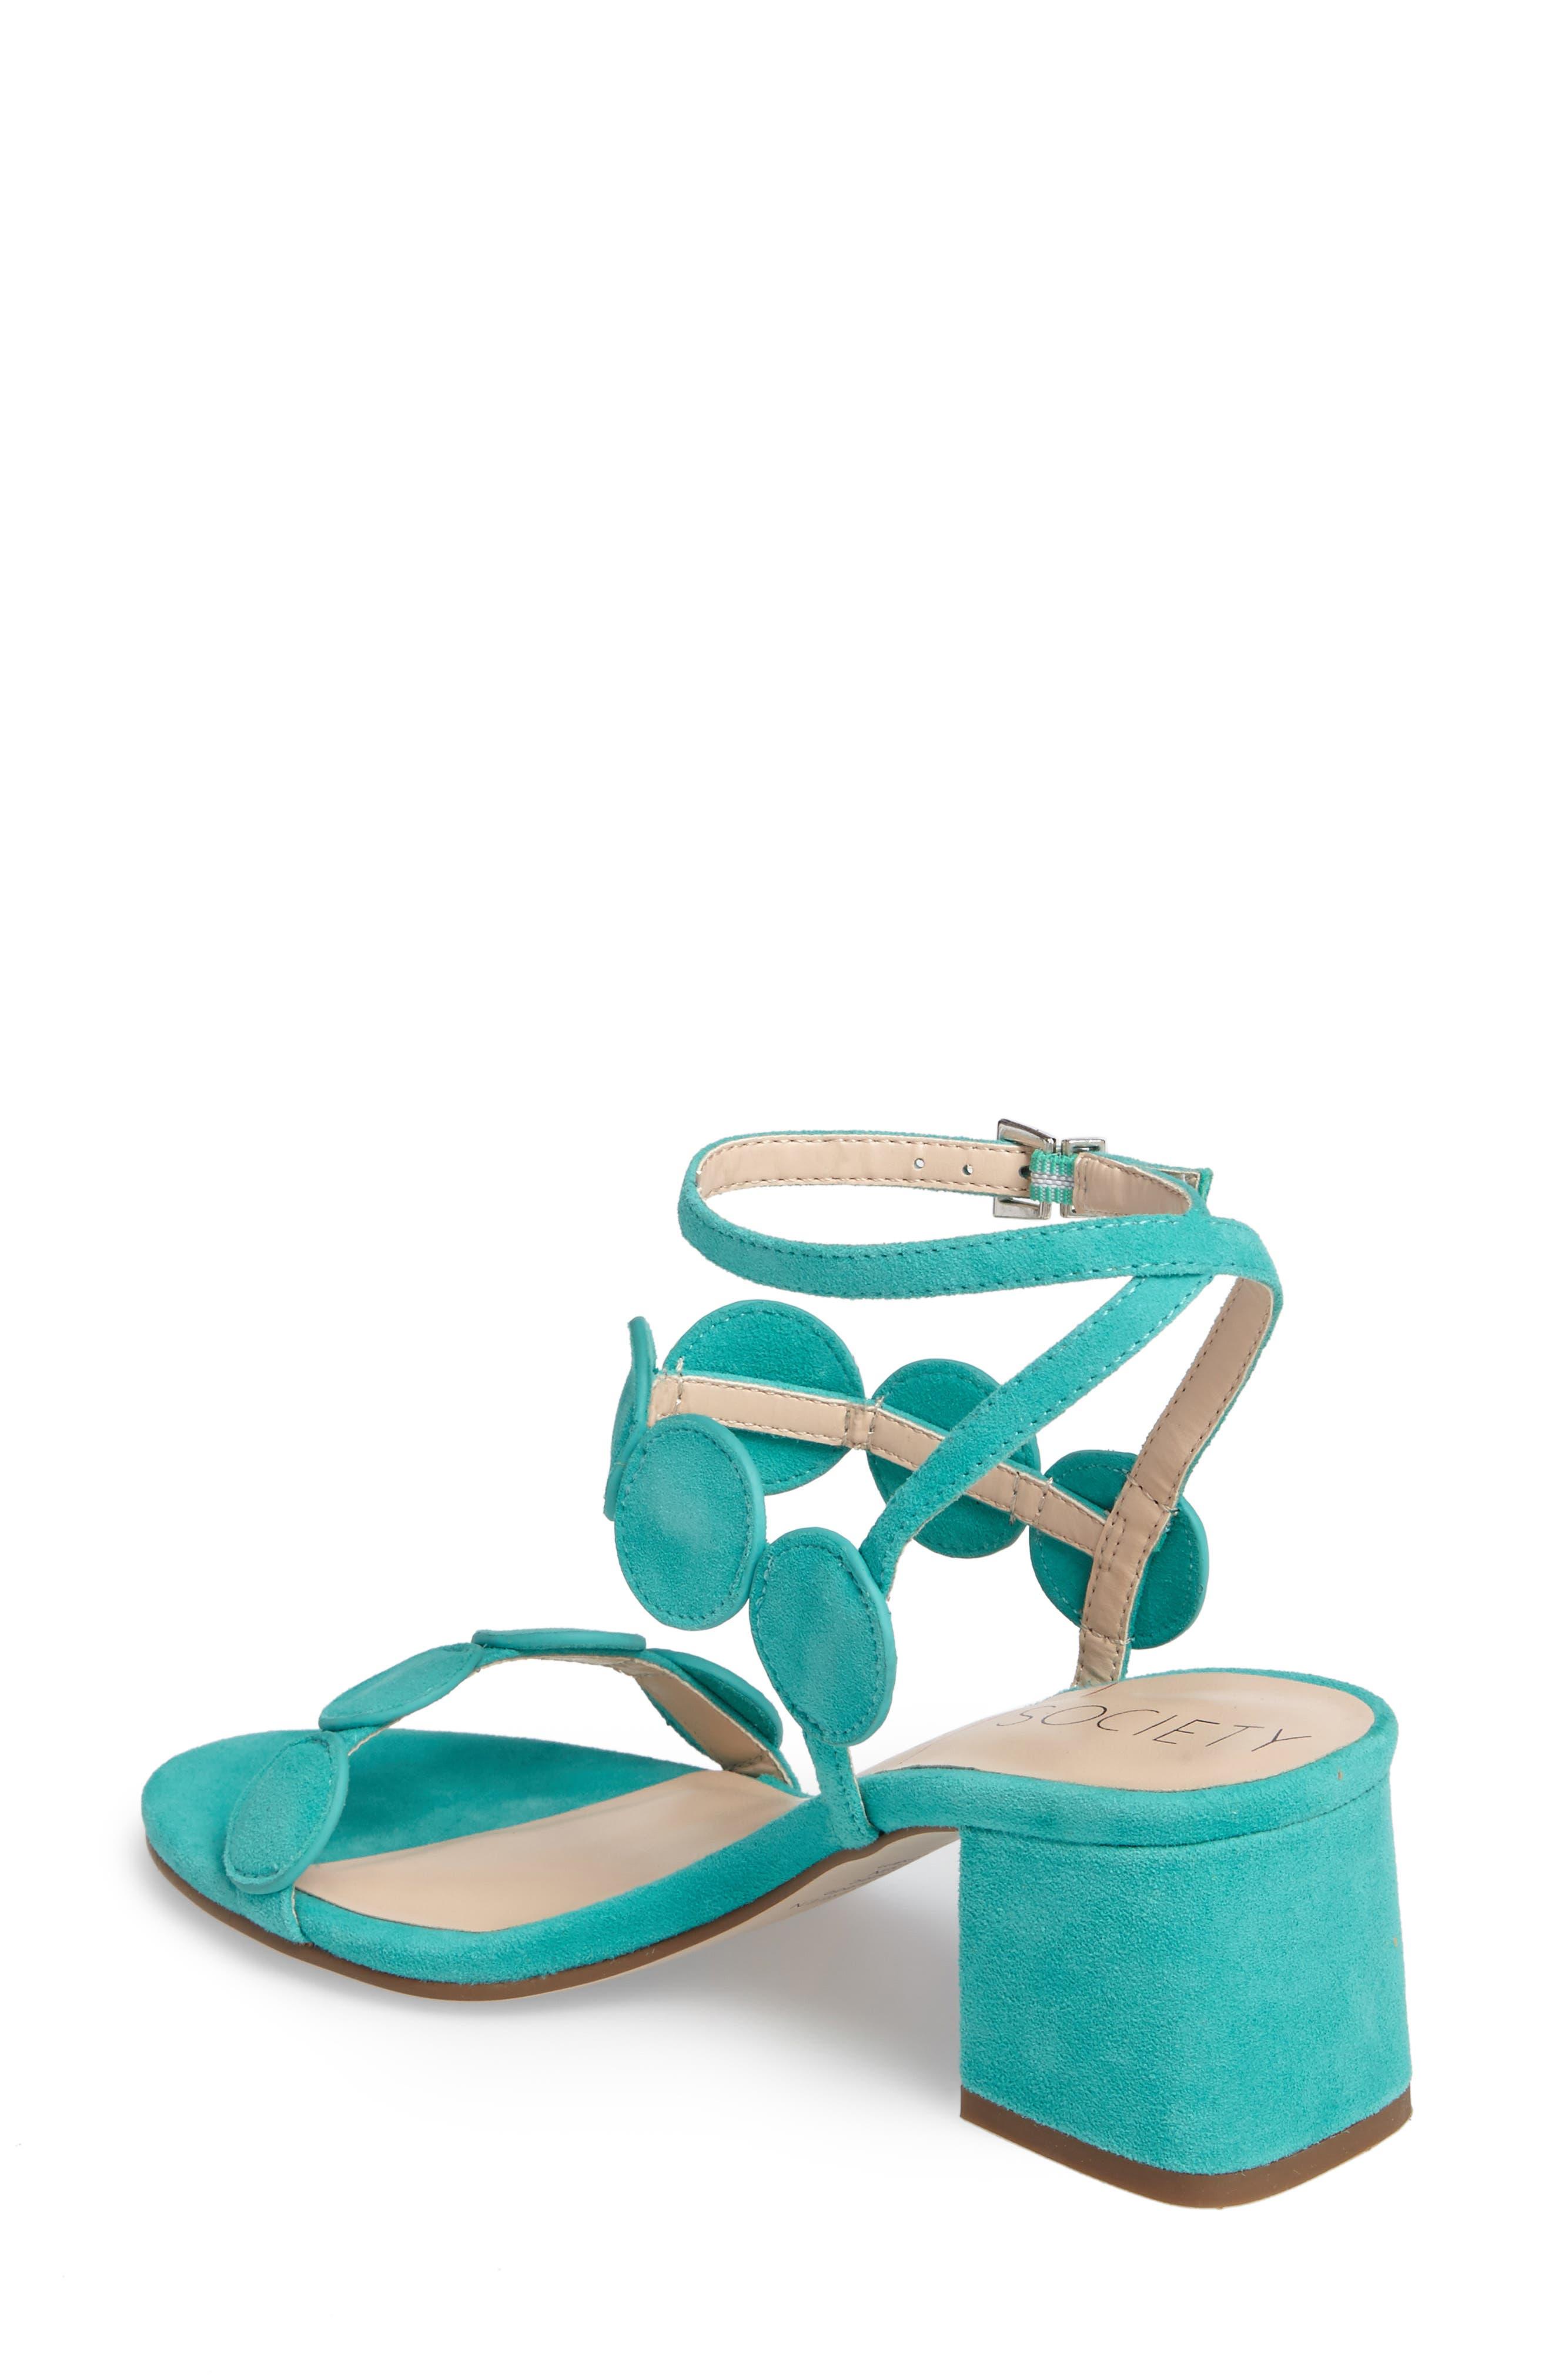 Shea Block Heel Sandal,                             Alternate thumbnail 12, color,